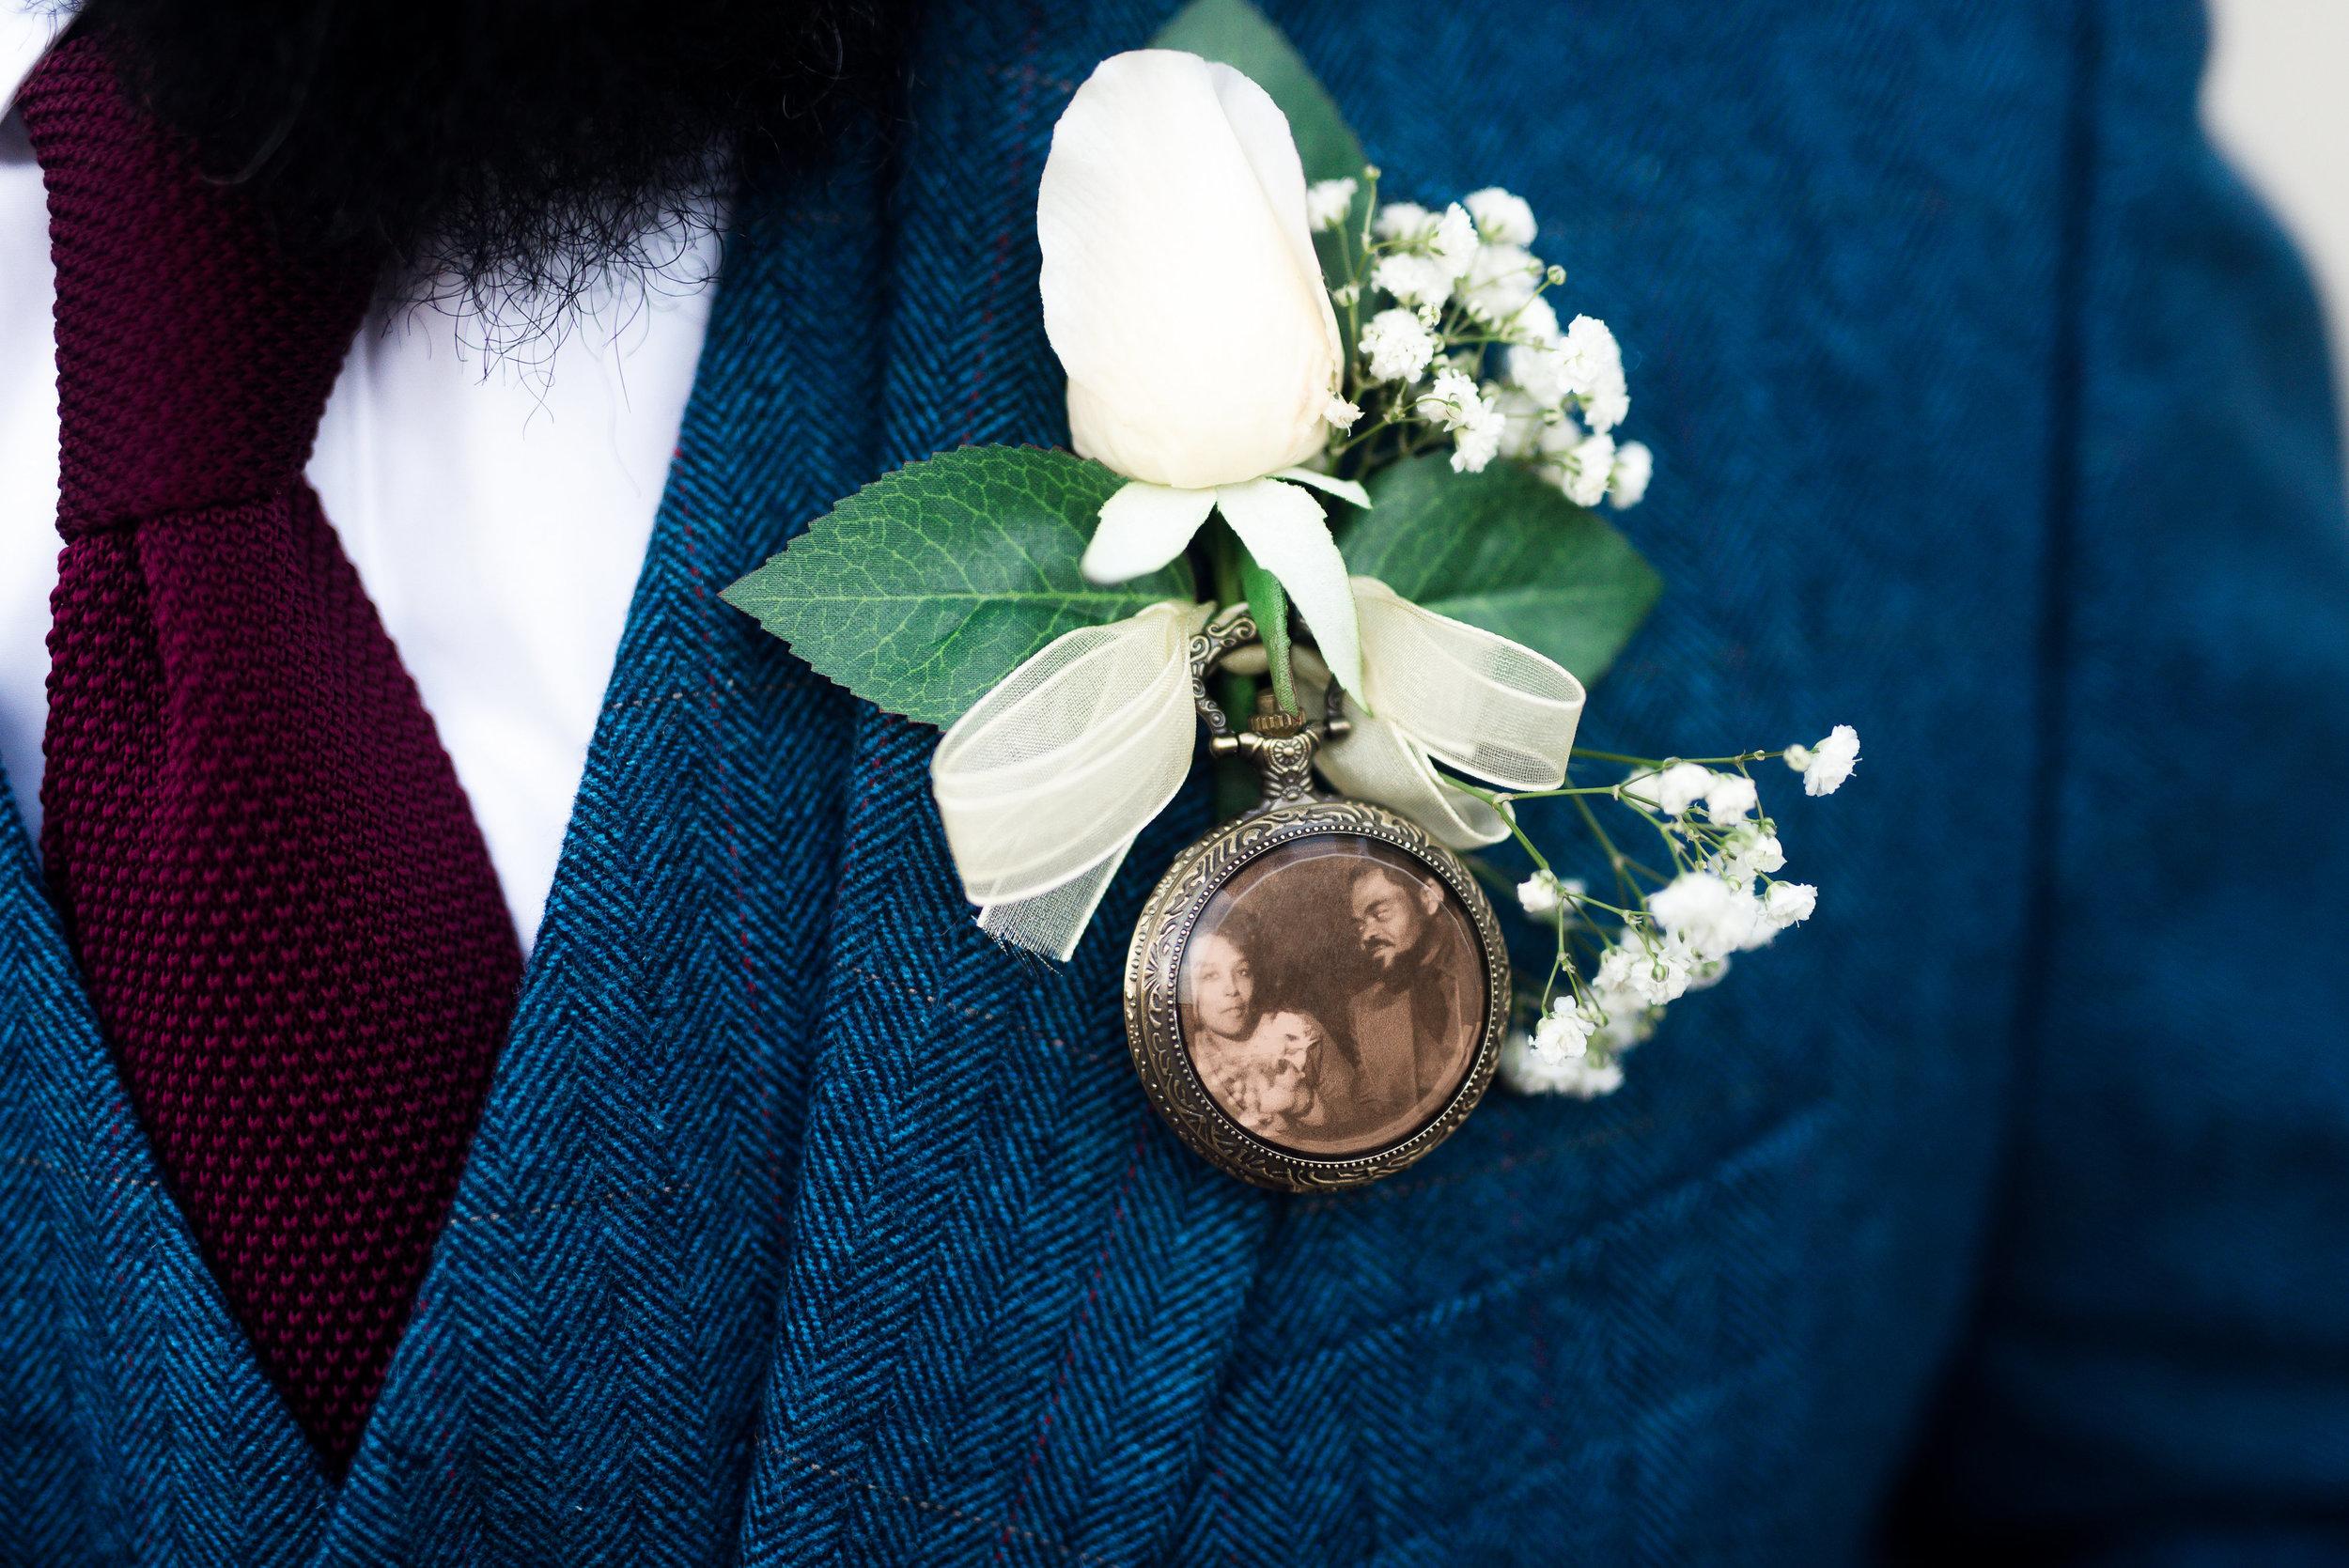 TC-Jessica-Garr-Pharris-Photography-Real-Wedding-25.jpg